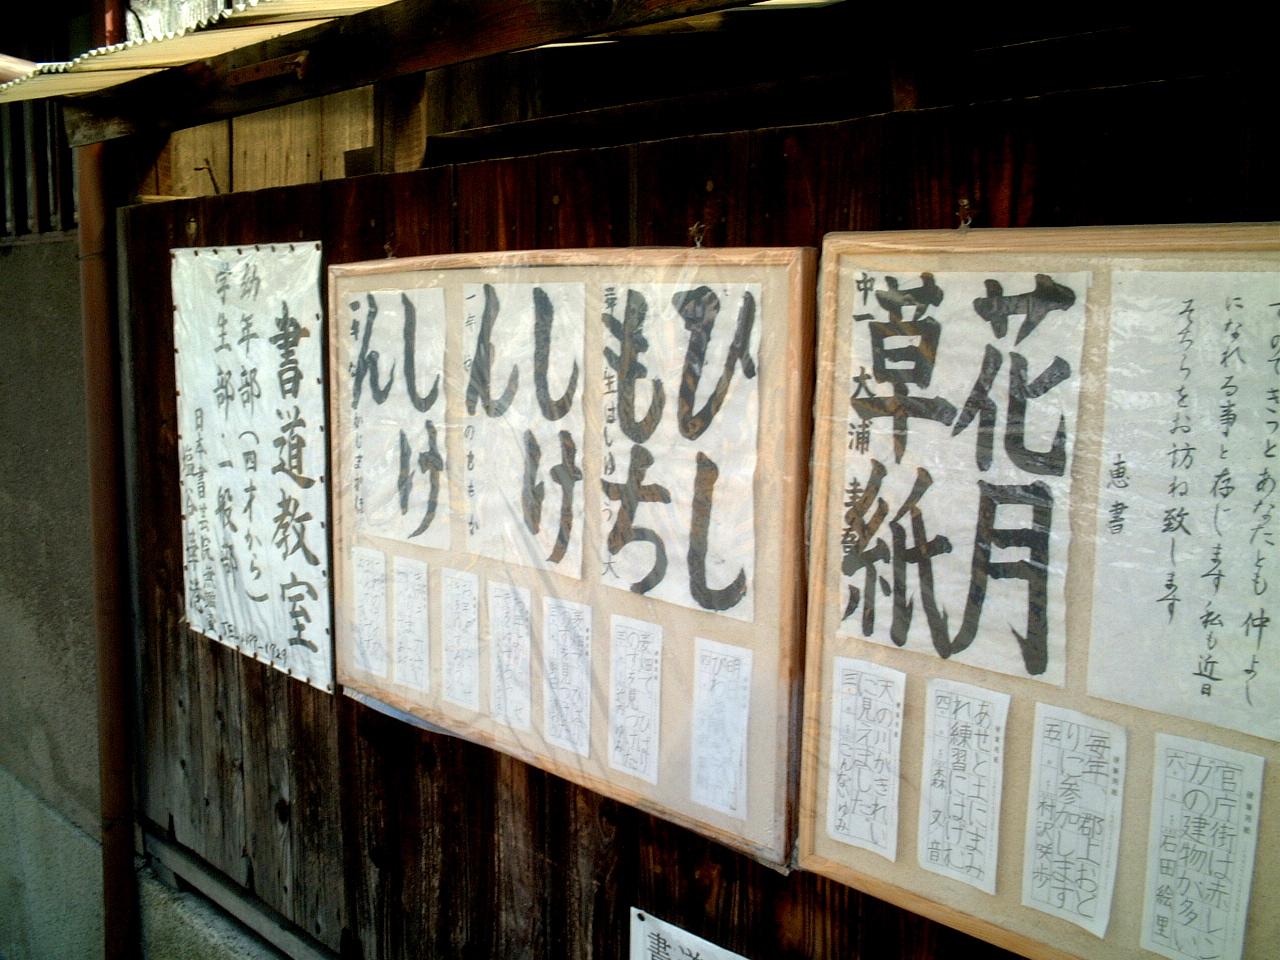 Japanische schrift wikiwand for Japanisches haus name